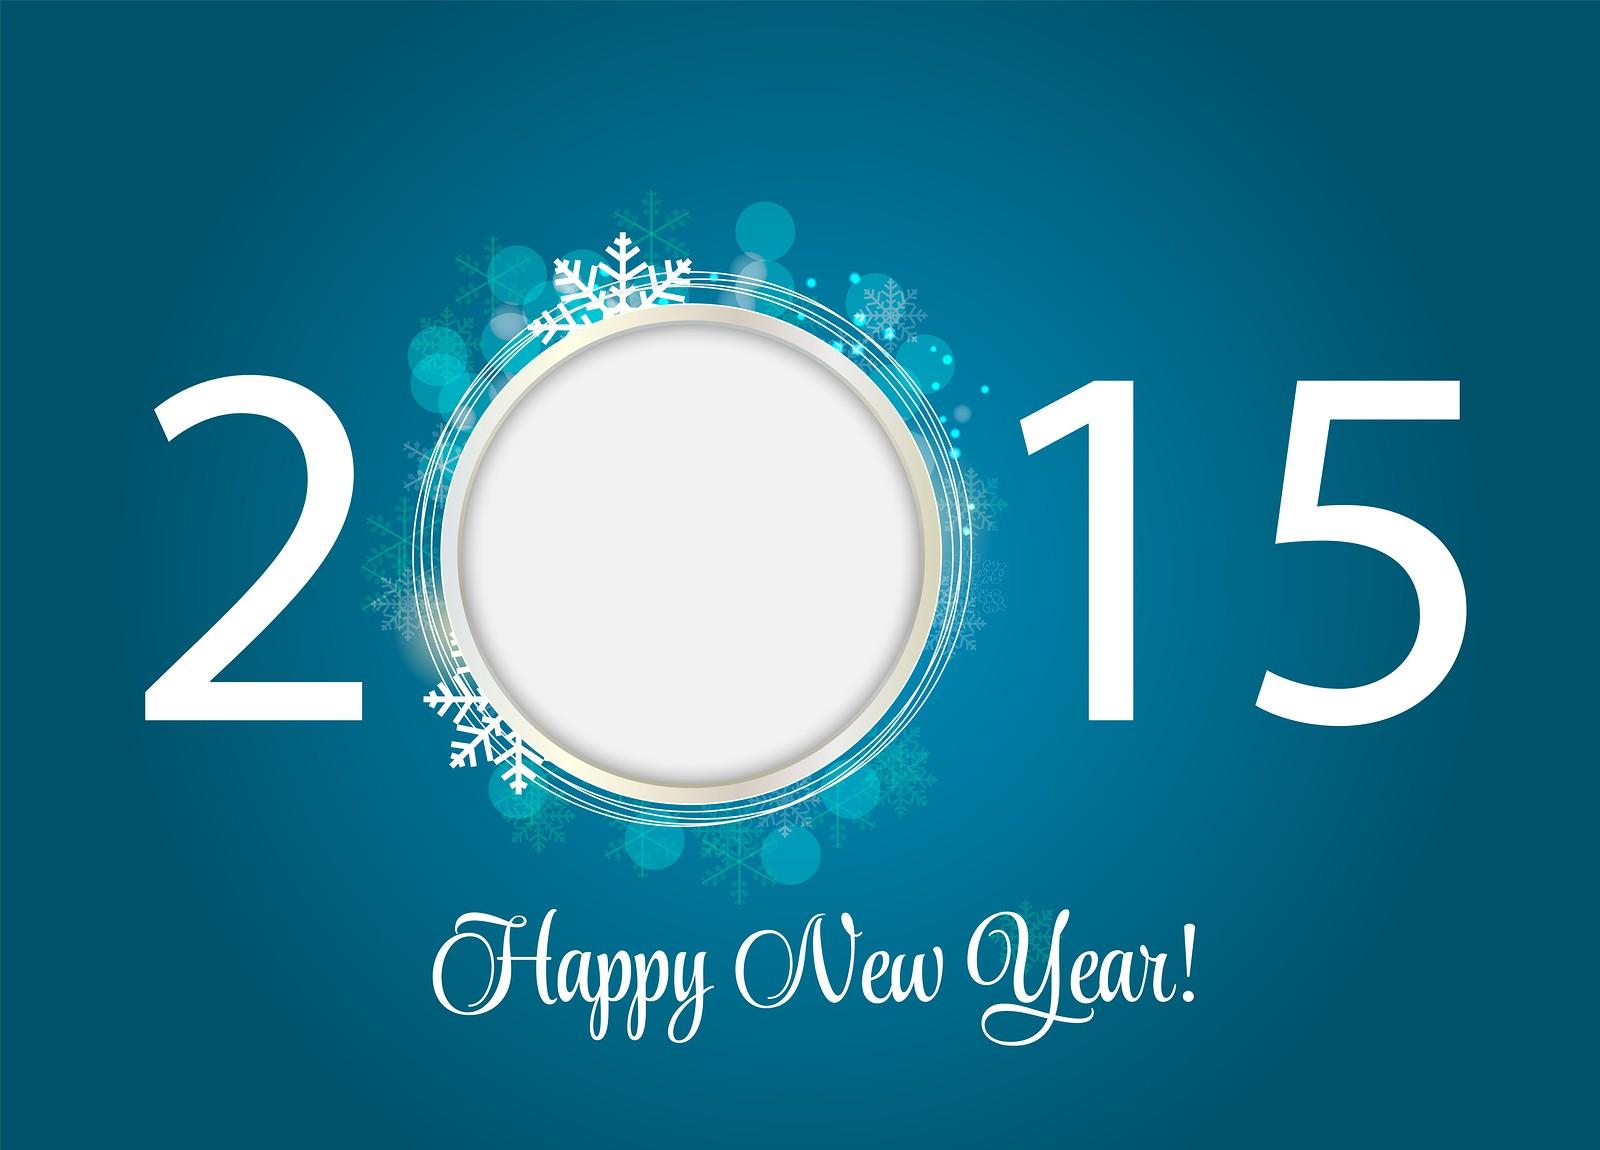 2015 HD Wallpapers Top 10 New Year Desktop background Wallpaper 1600x1150